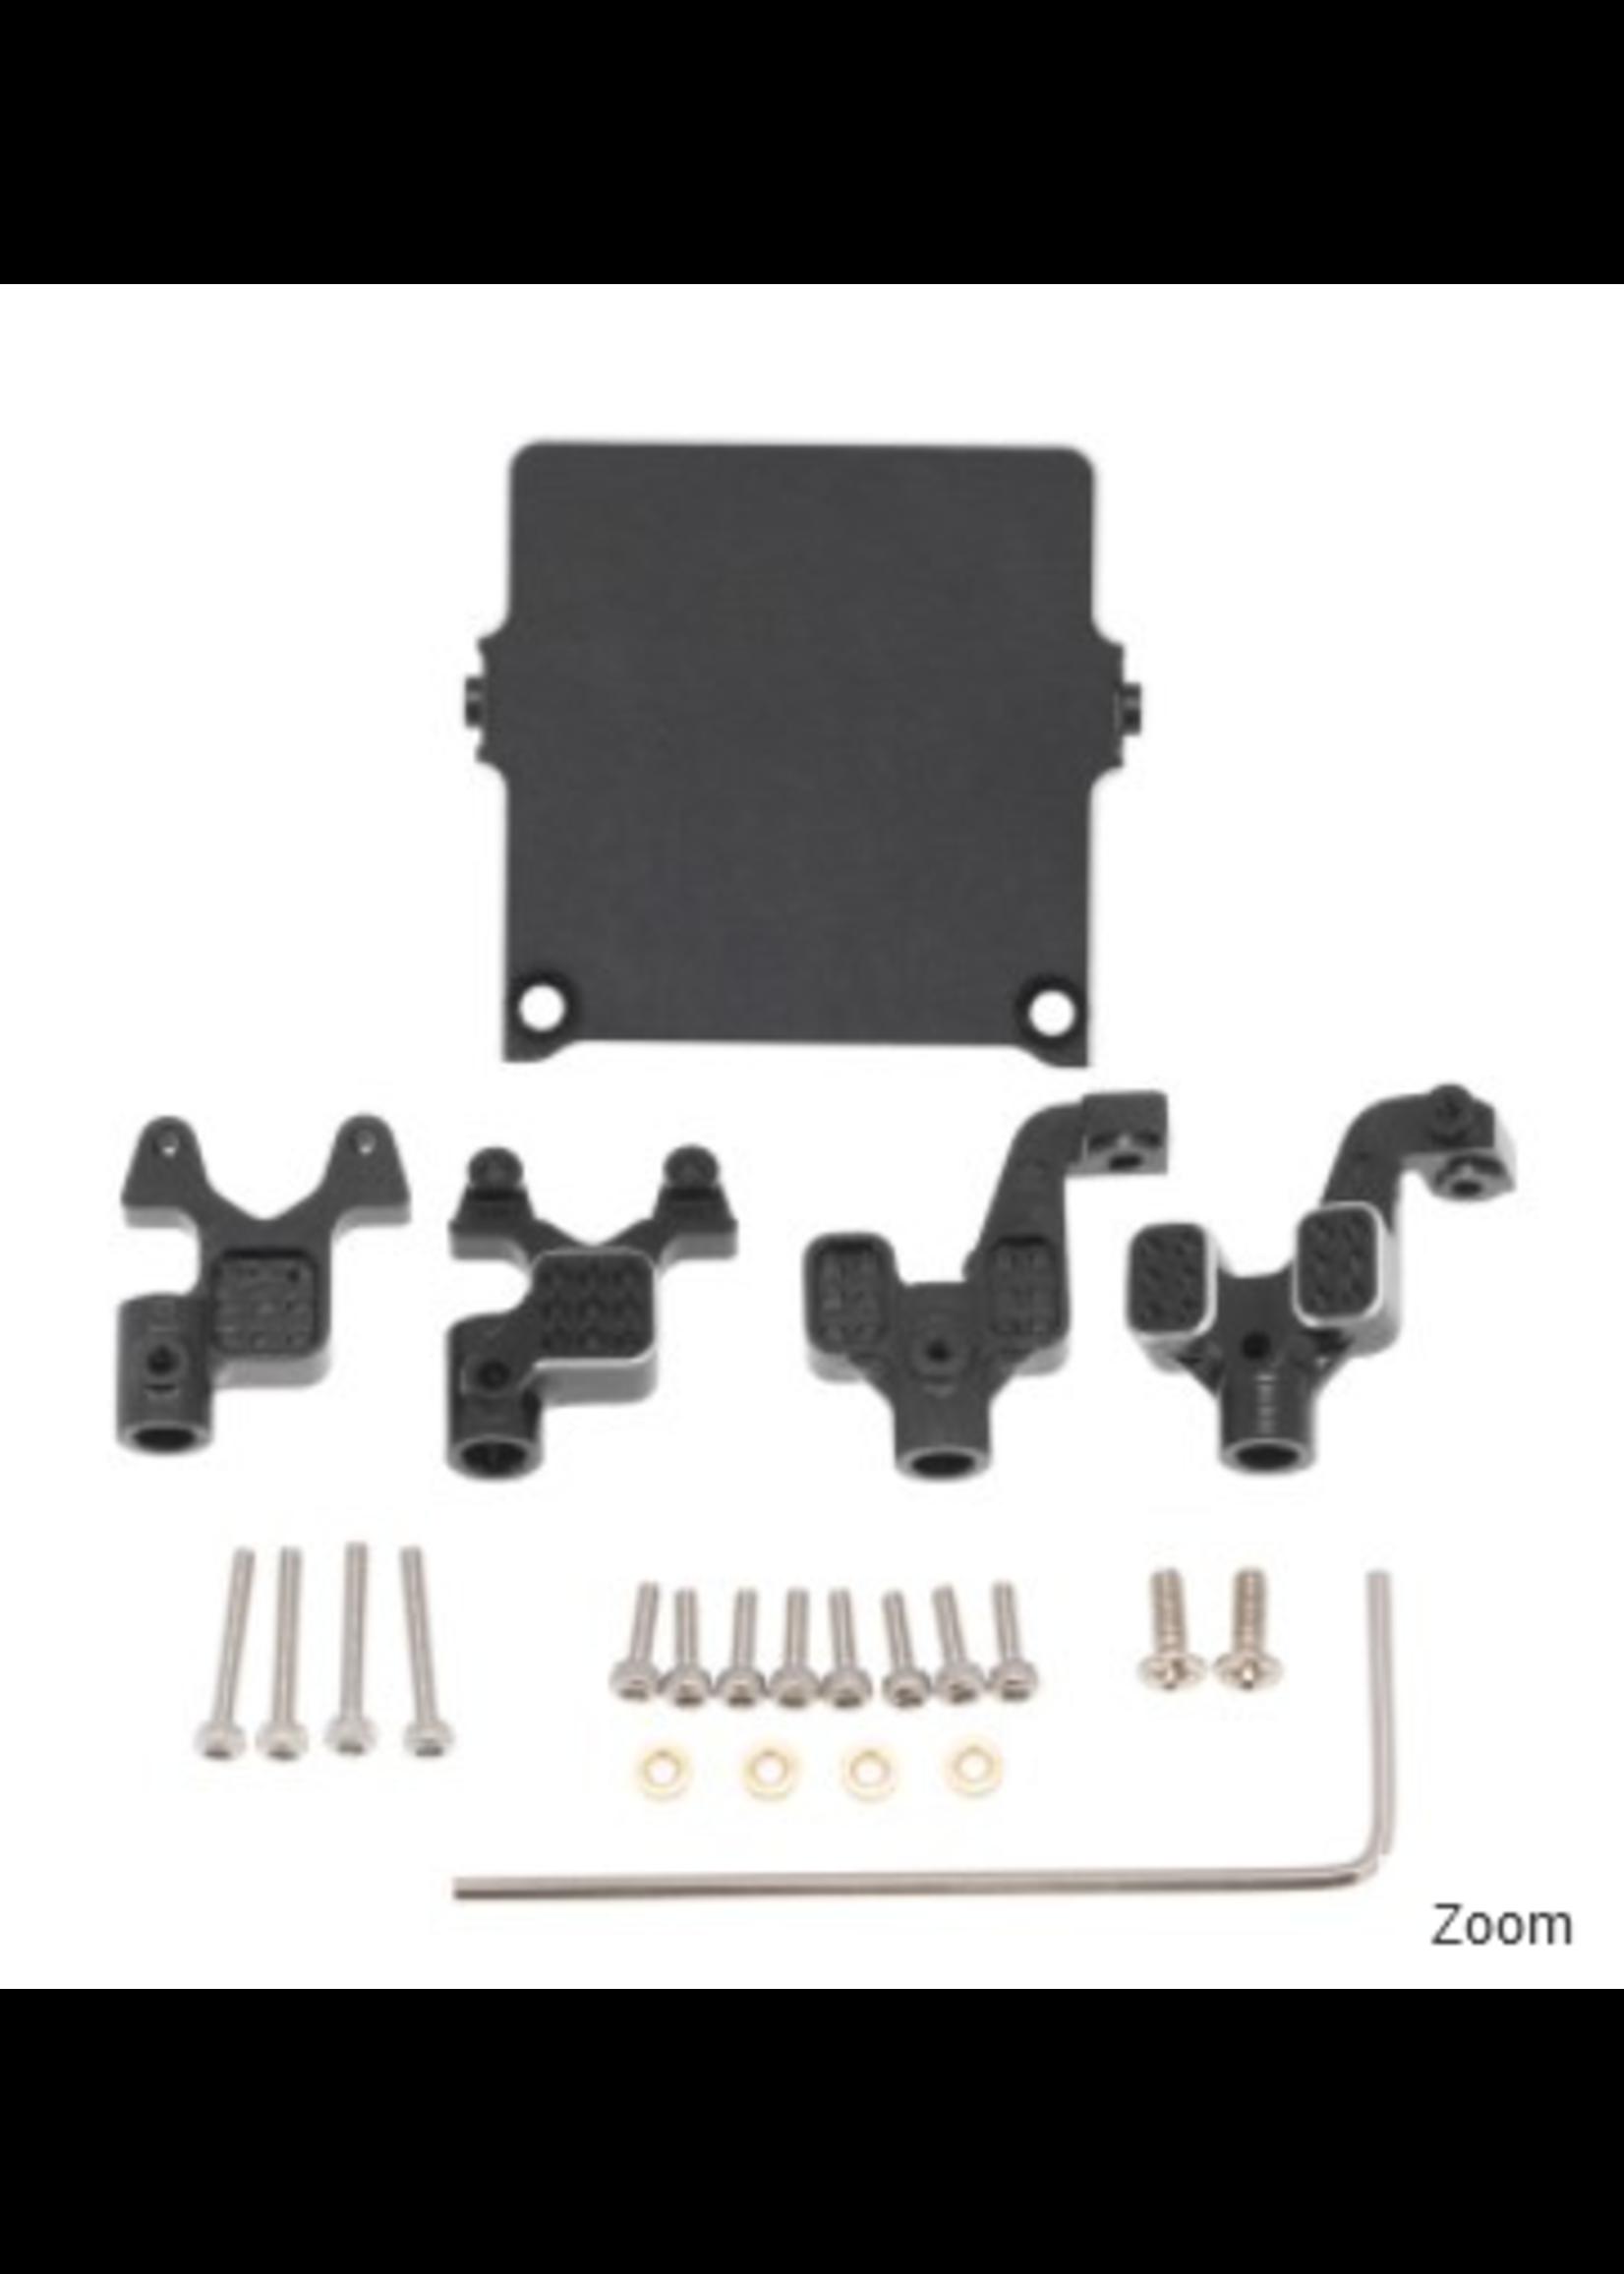 Hobby Details DTSCX24-12 Hobby Details Axial SCX24 Aluminum Front Rear Suspension Bracket Metal Shock Mount 1set